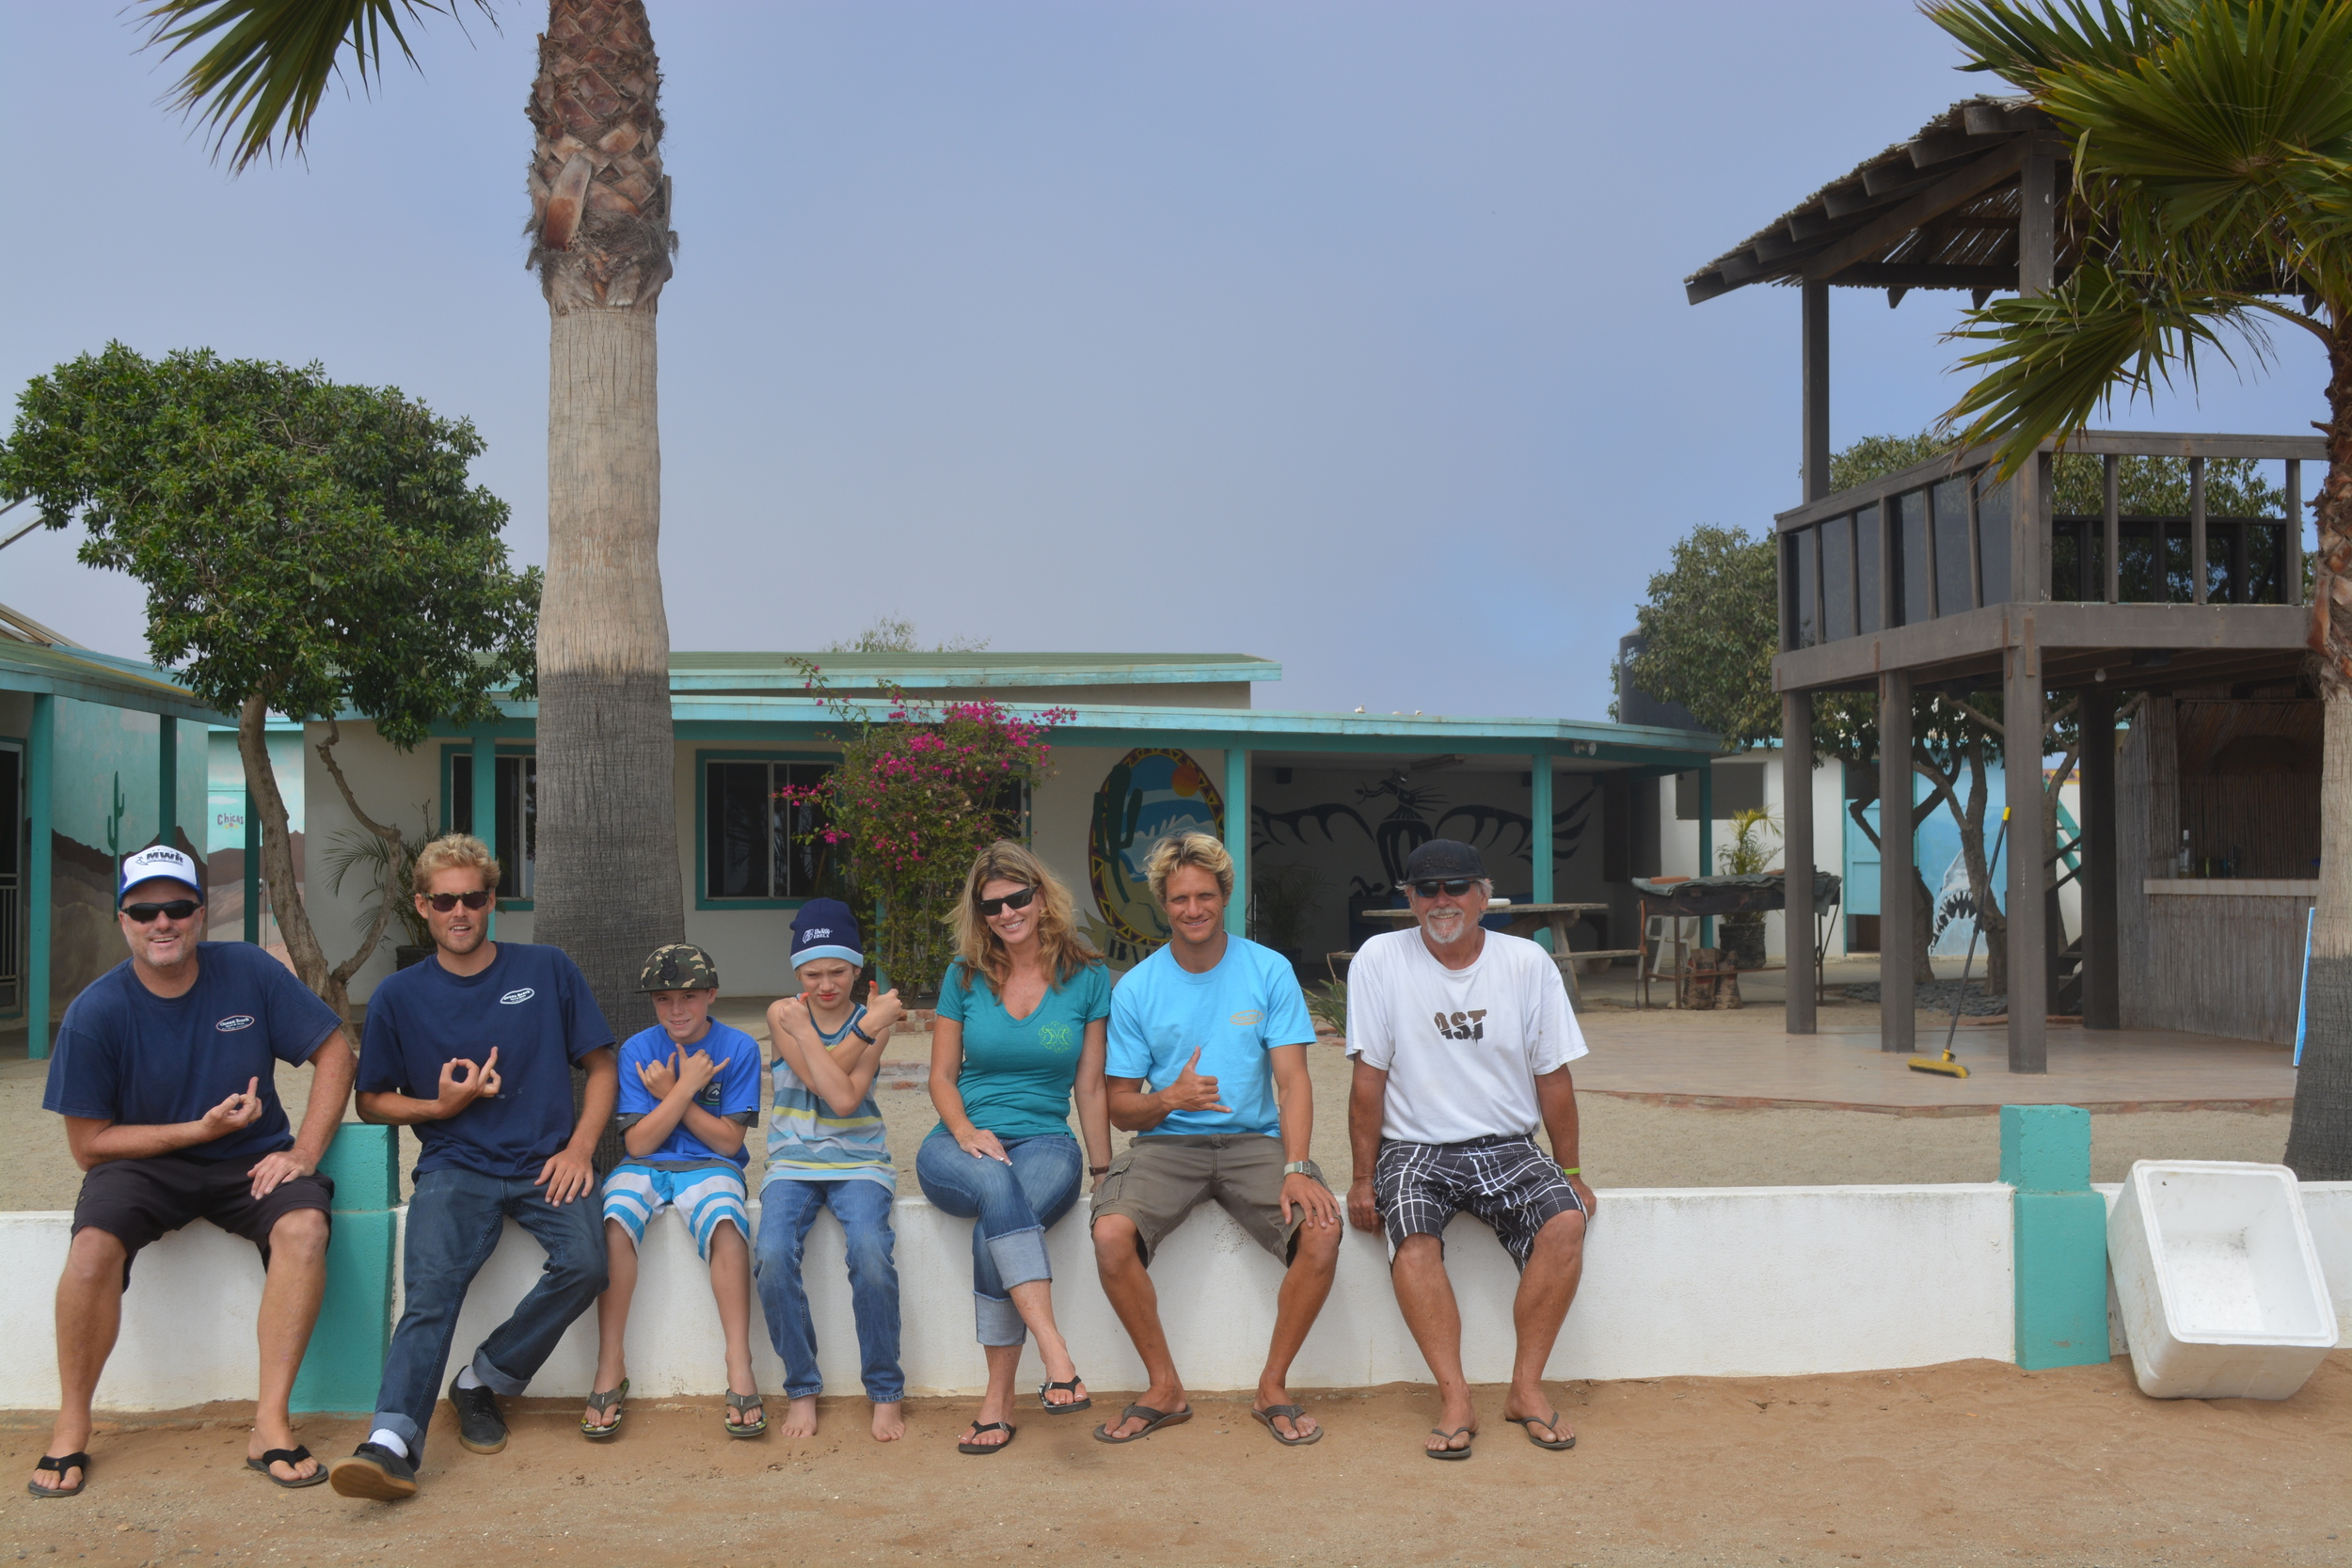 Baja California 10-5-13 Shipwrecks Surfing Adventure Ocean Experience Surf School San Diego (42).JPG